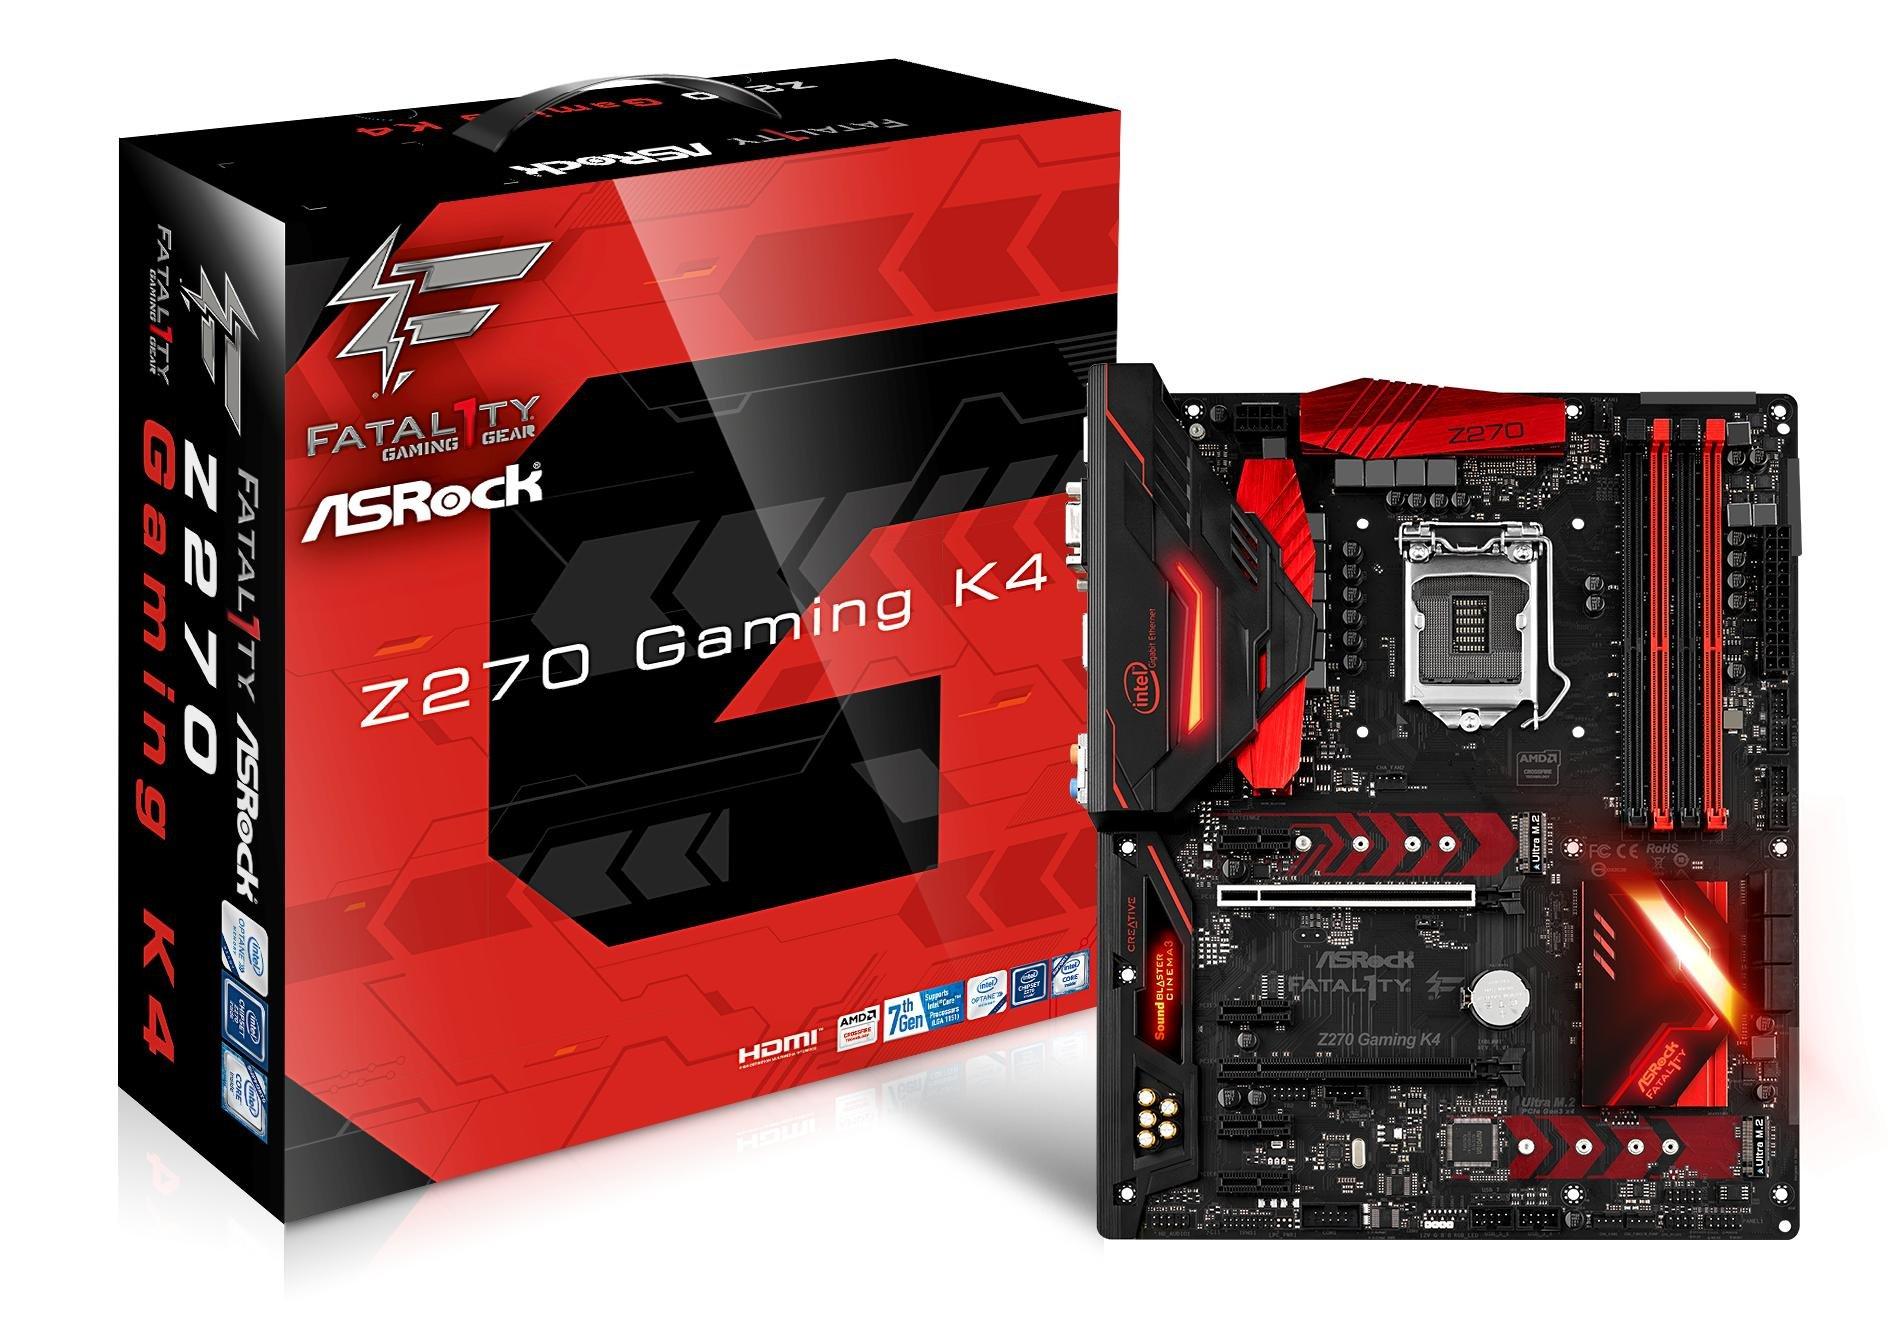 ASRock Motherboard Motherboards Z270 Gaming K4 by ASRock